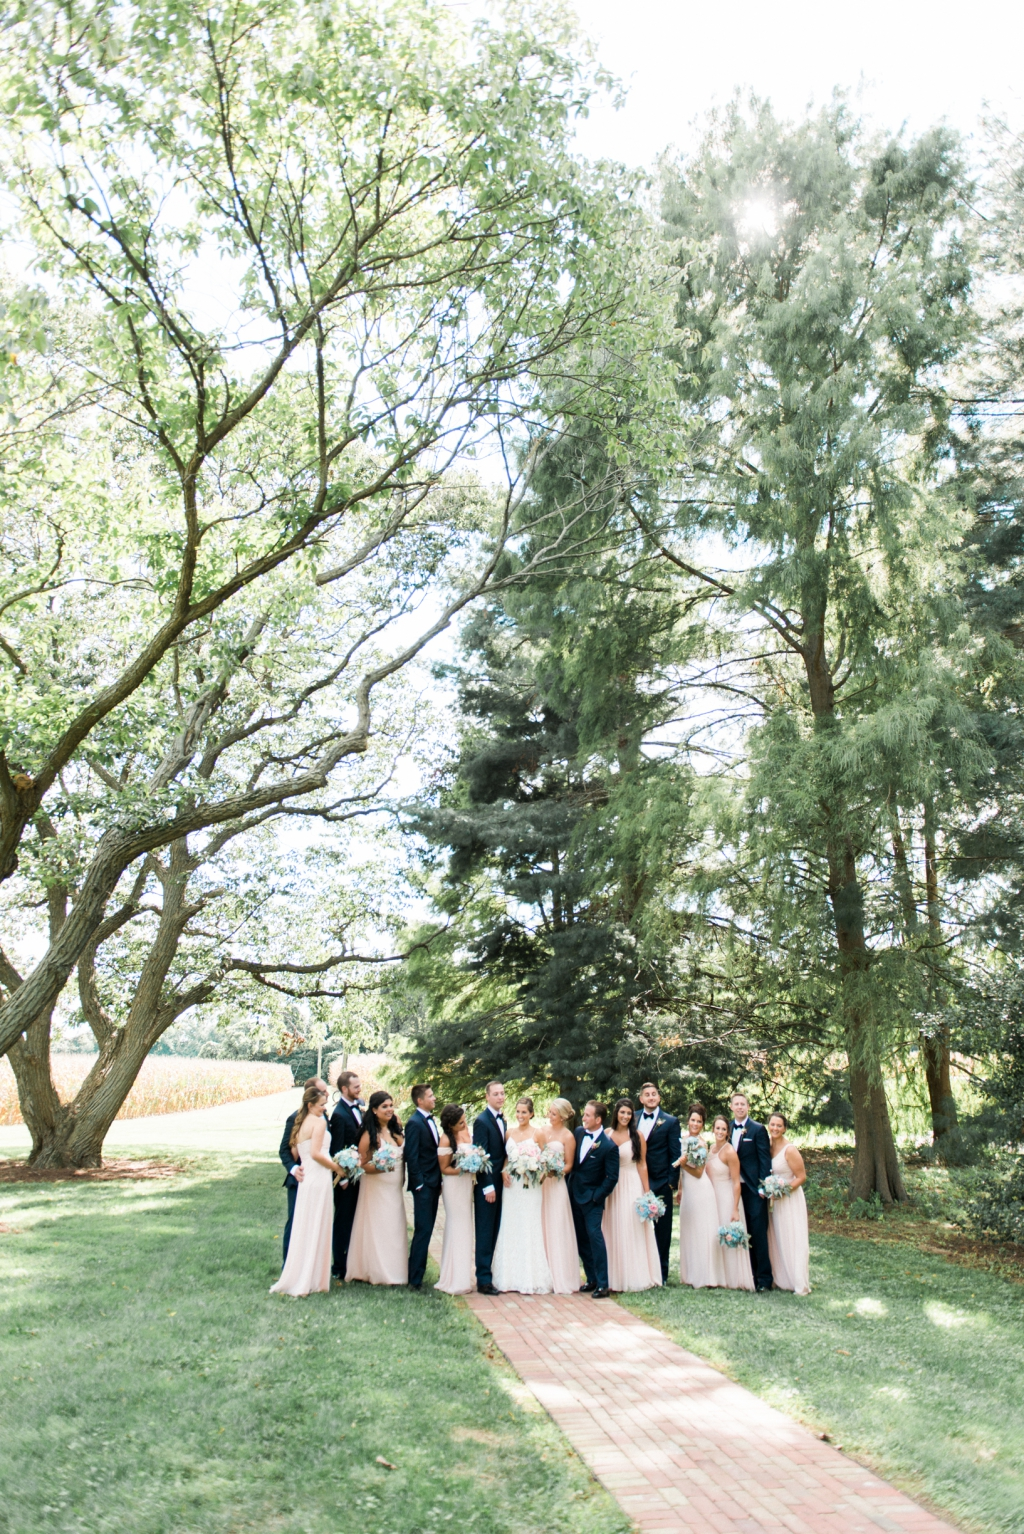 haley-richter-photography-buena-vista-confrence-center-wedding-summer-042